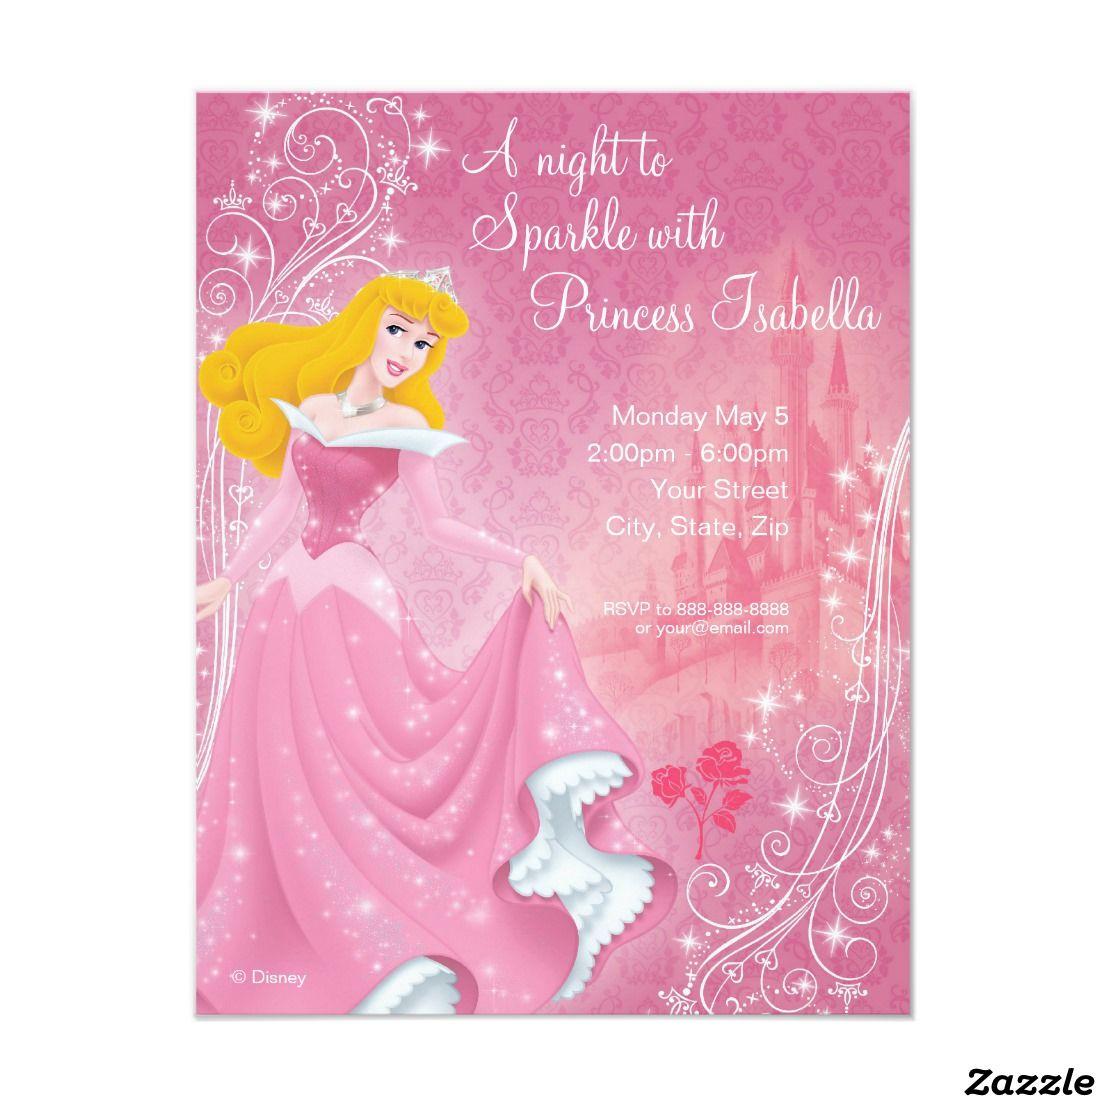 Sleeping Beauty Birthday Invitation | Pinterest | Birthdays